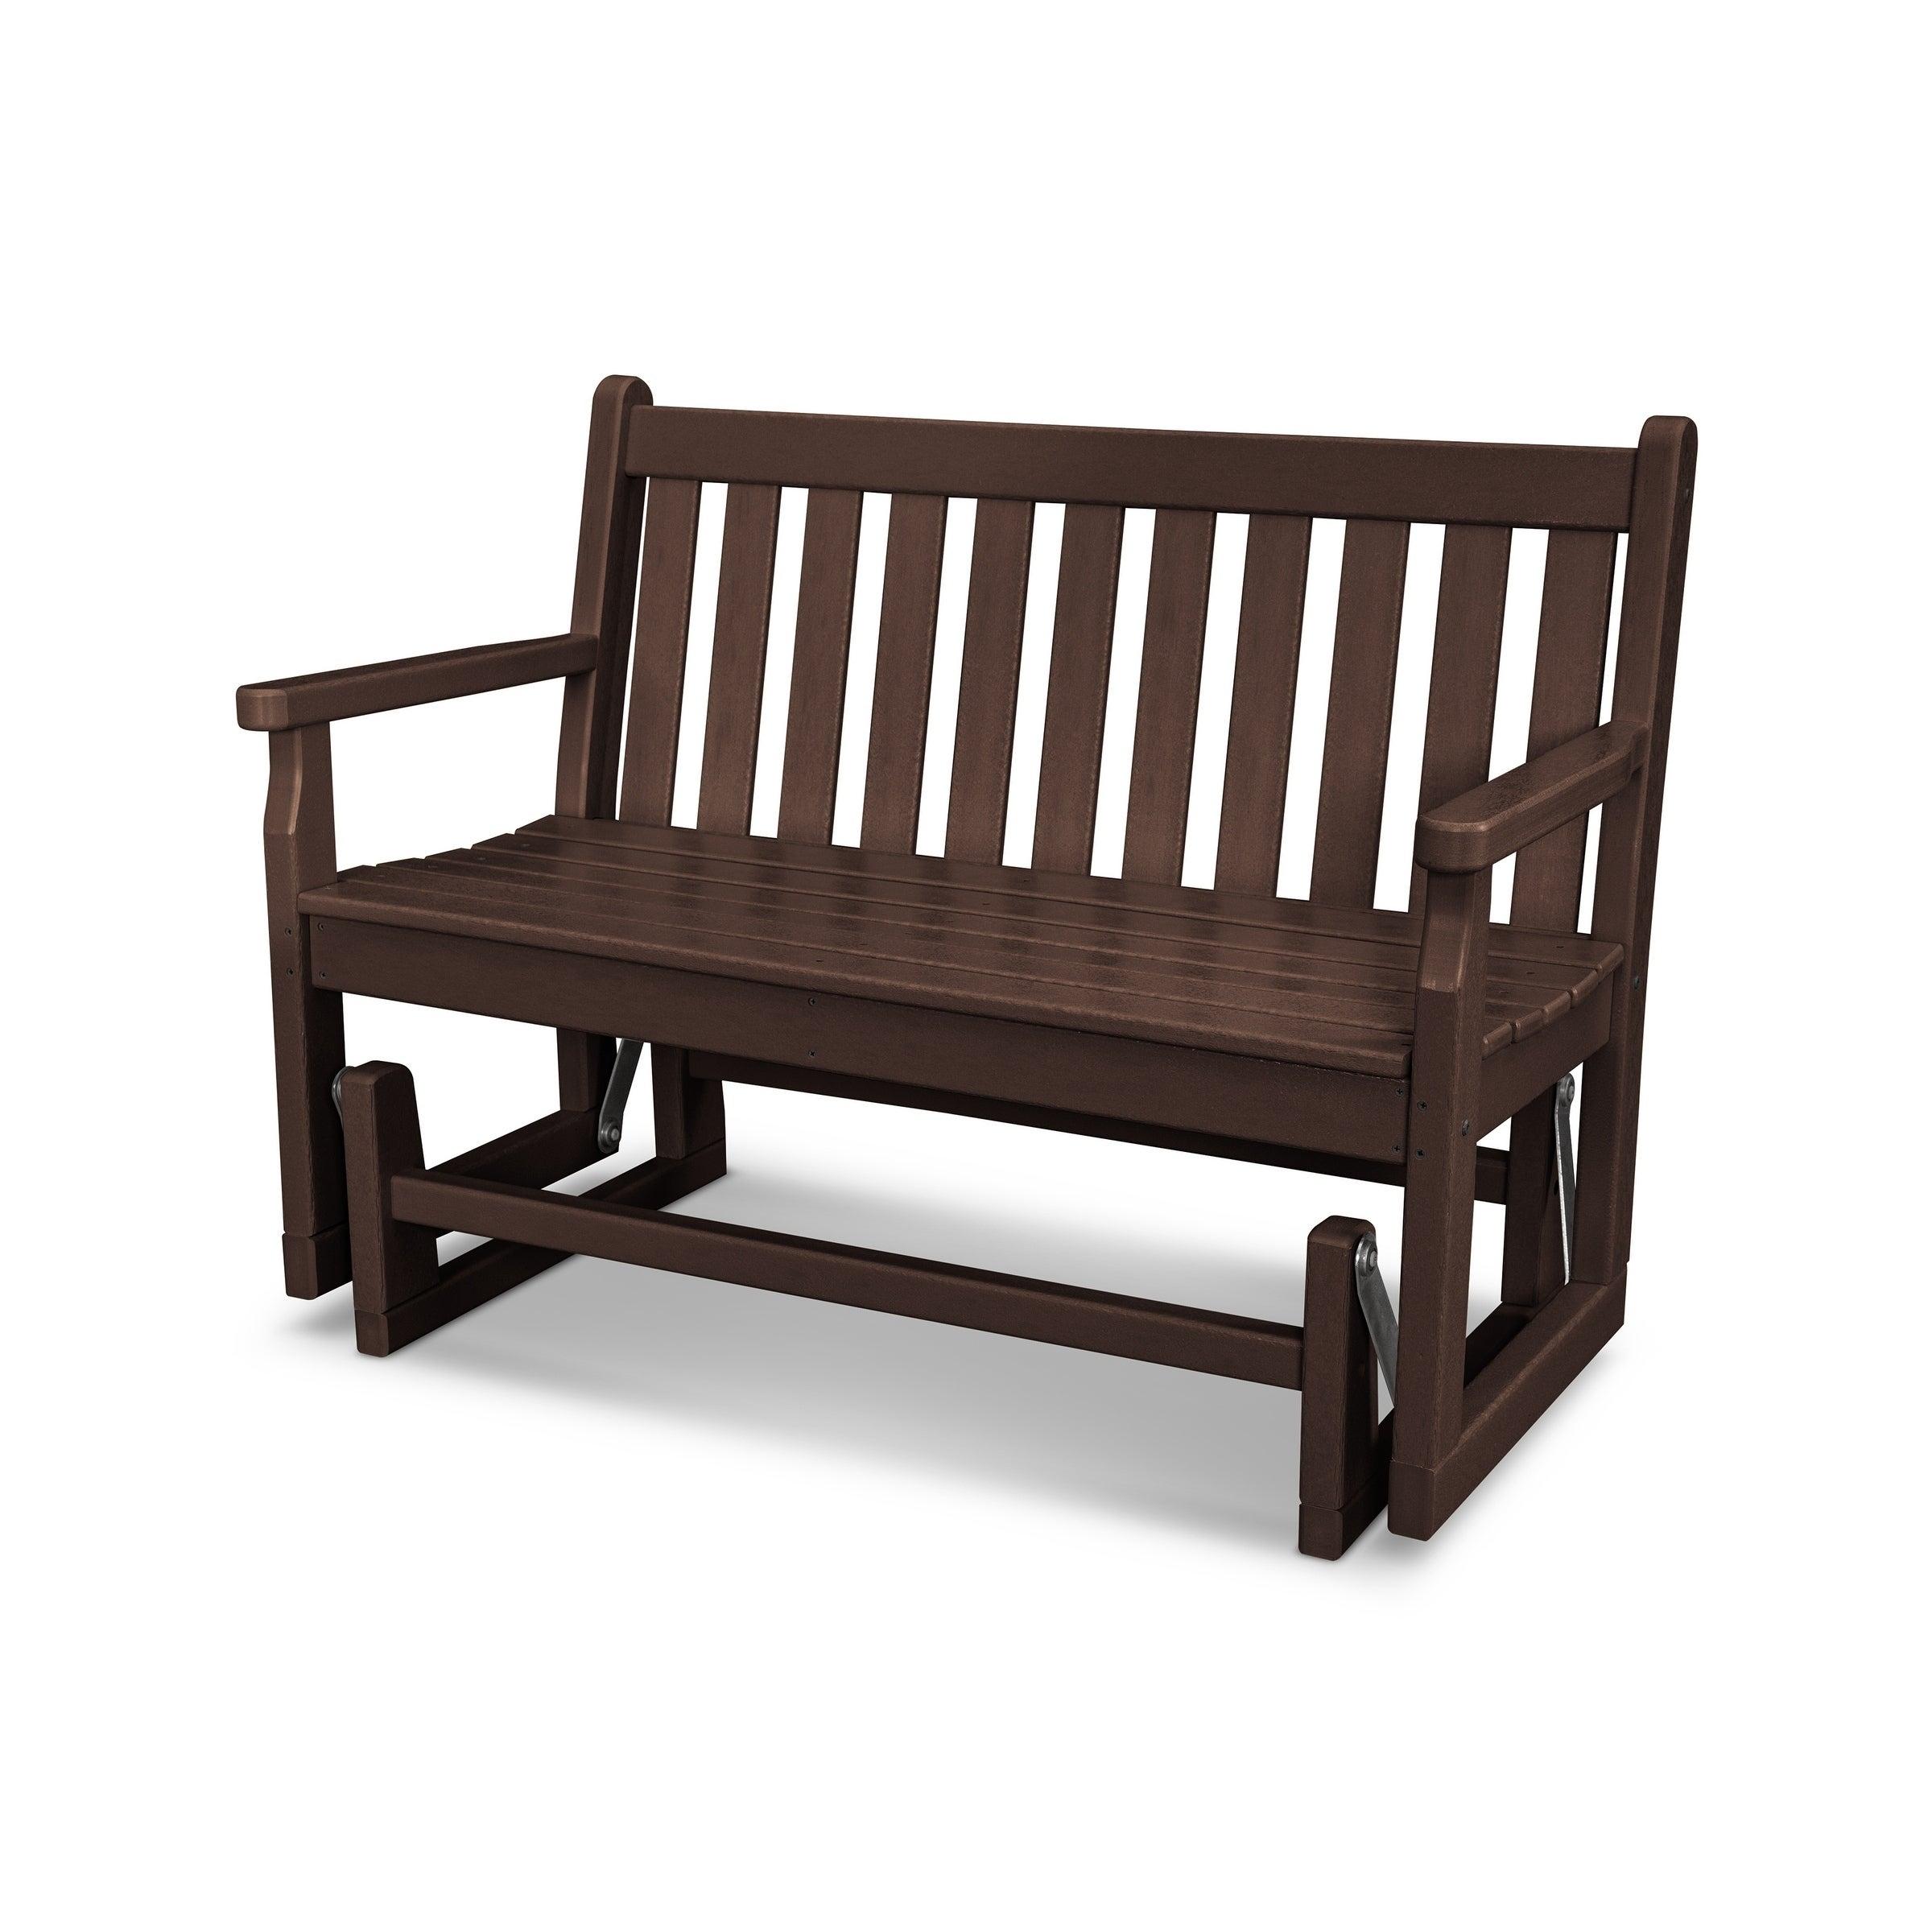 Phenomenal Polywood Traditional 48 Outdoor Garden Bench Glider Machost Co Dining Chair Design Ideas Machostcouk